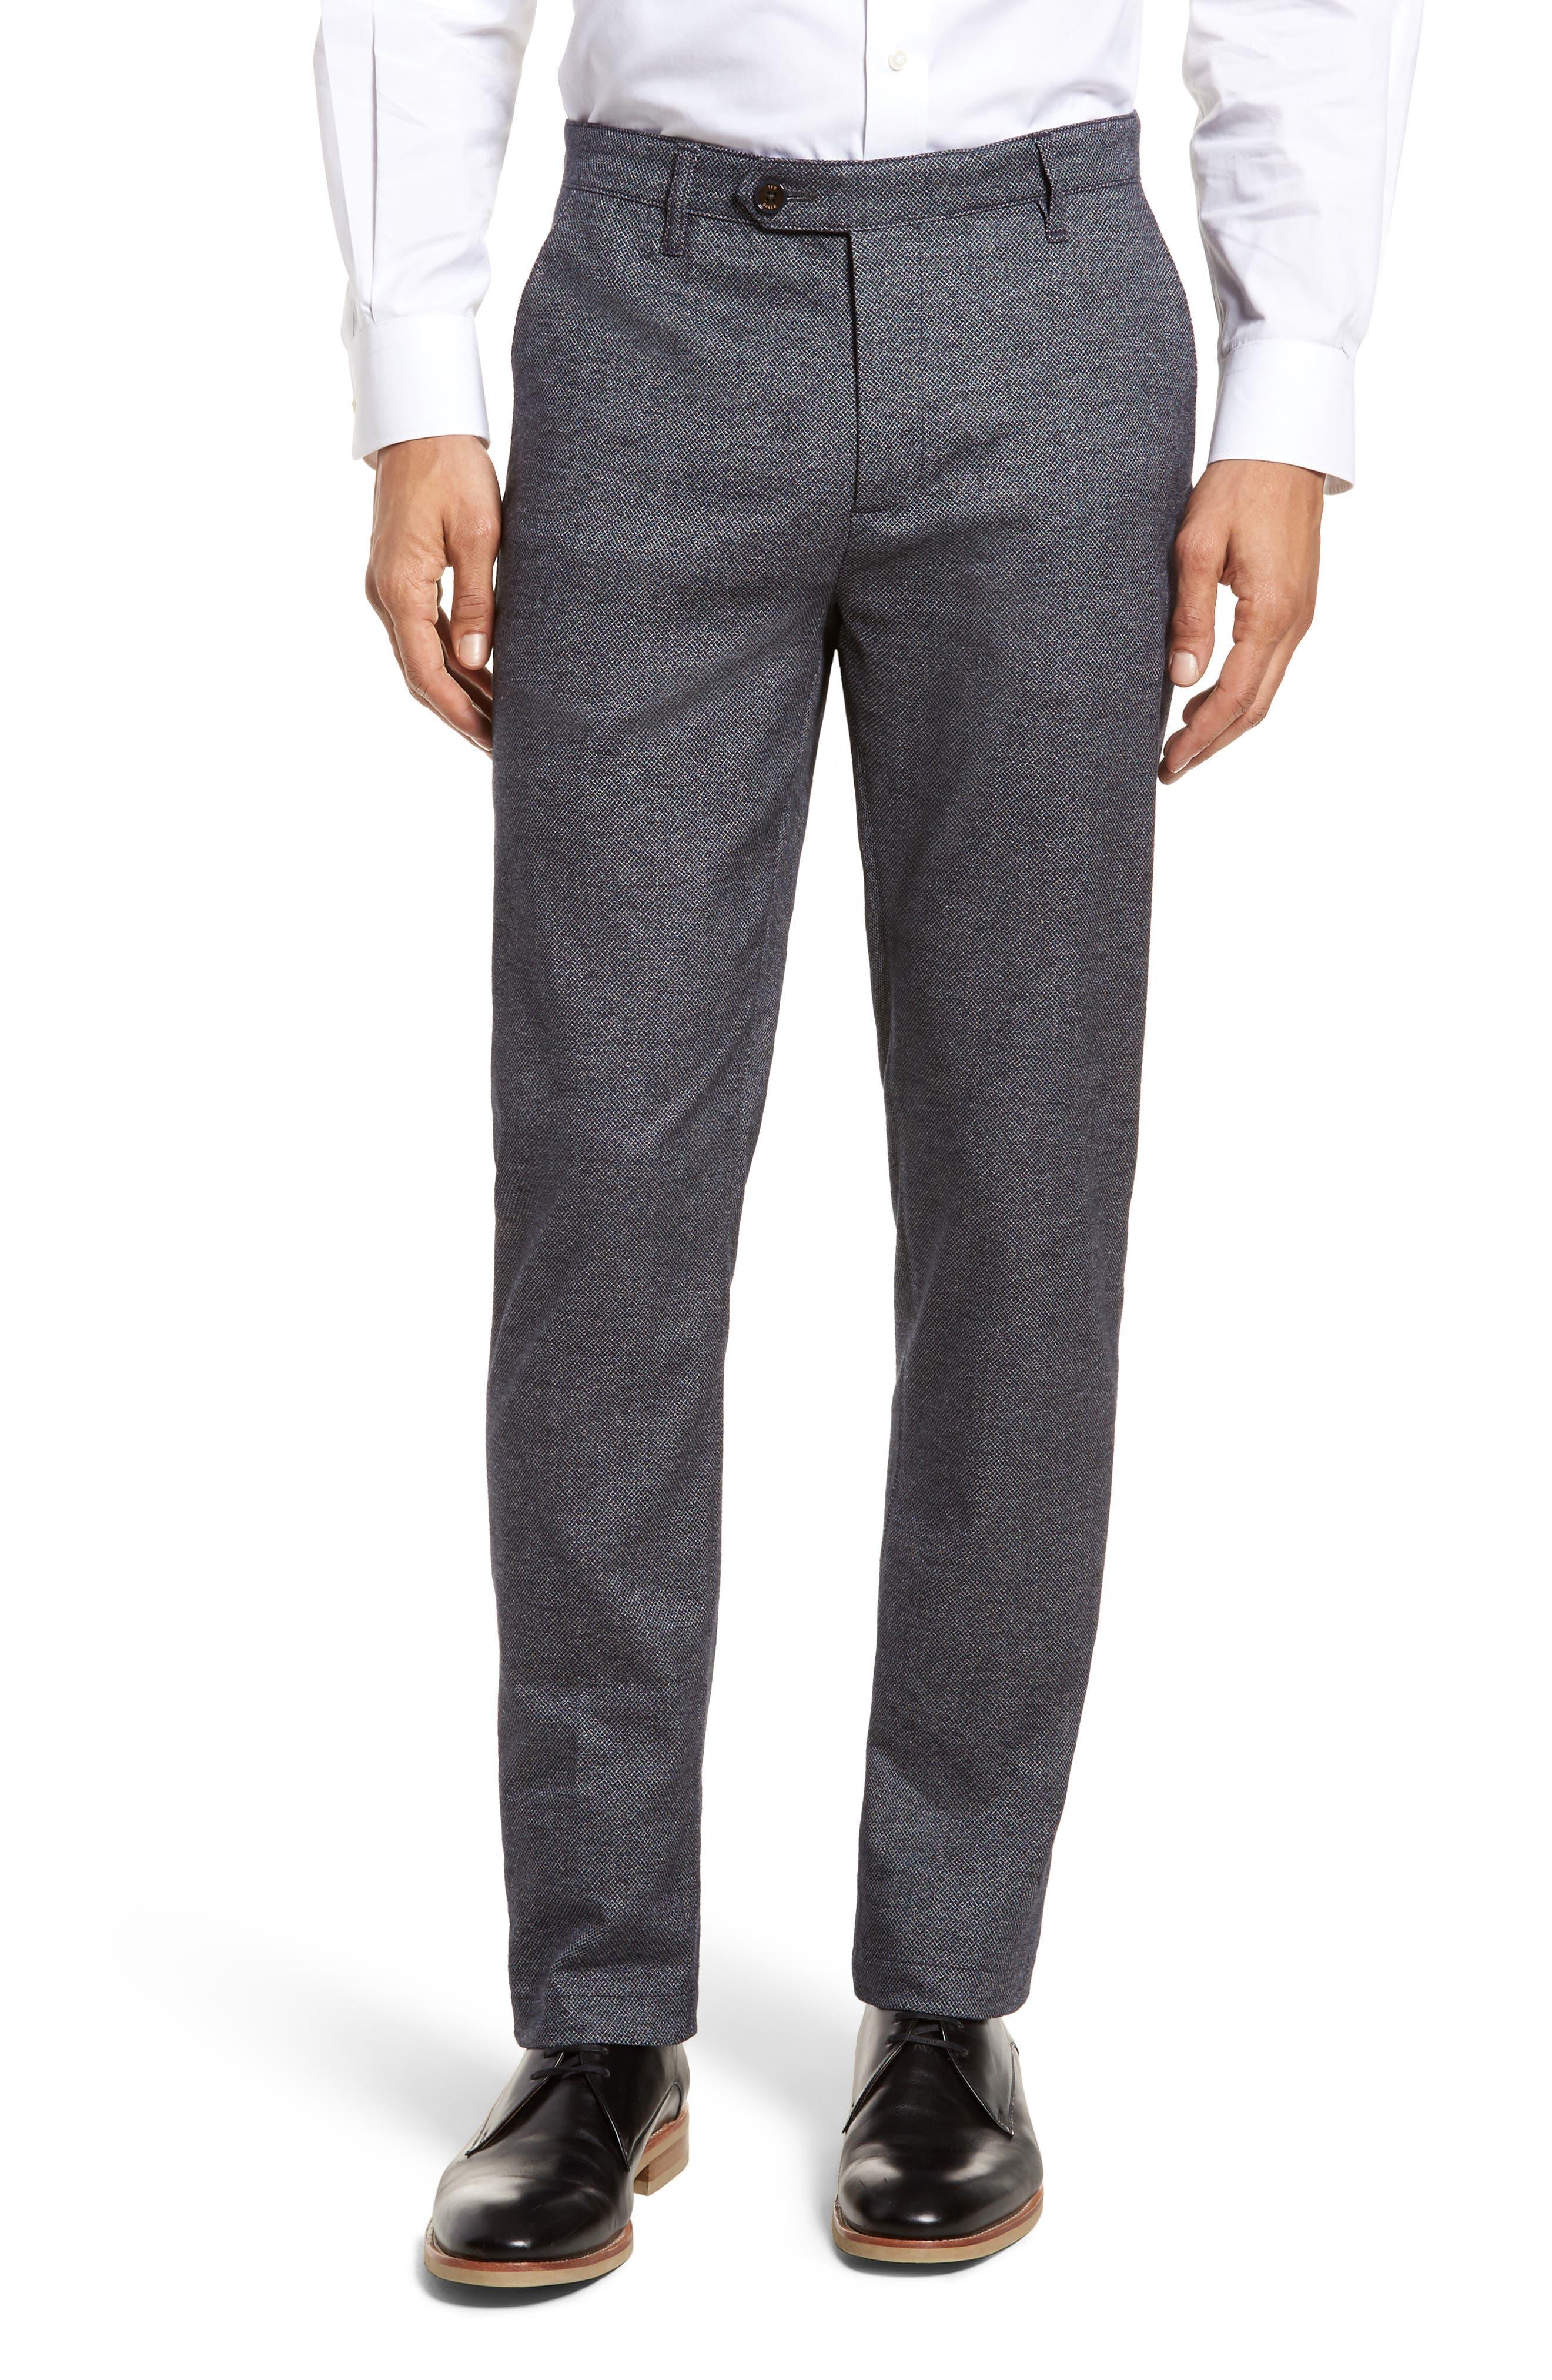 Pintztt Flat Front Stretch Solid Cotton Pants,                             Main thumbnail 1, color,                             Navy